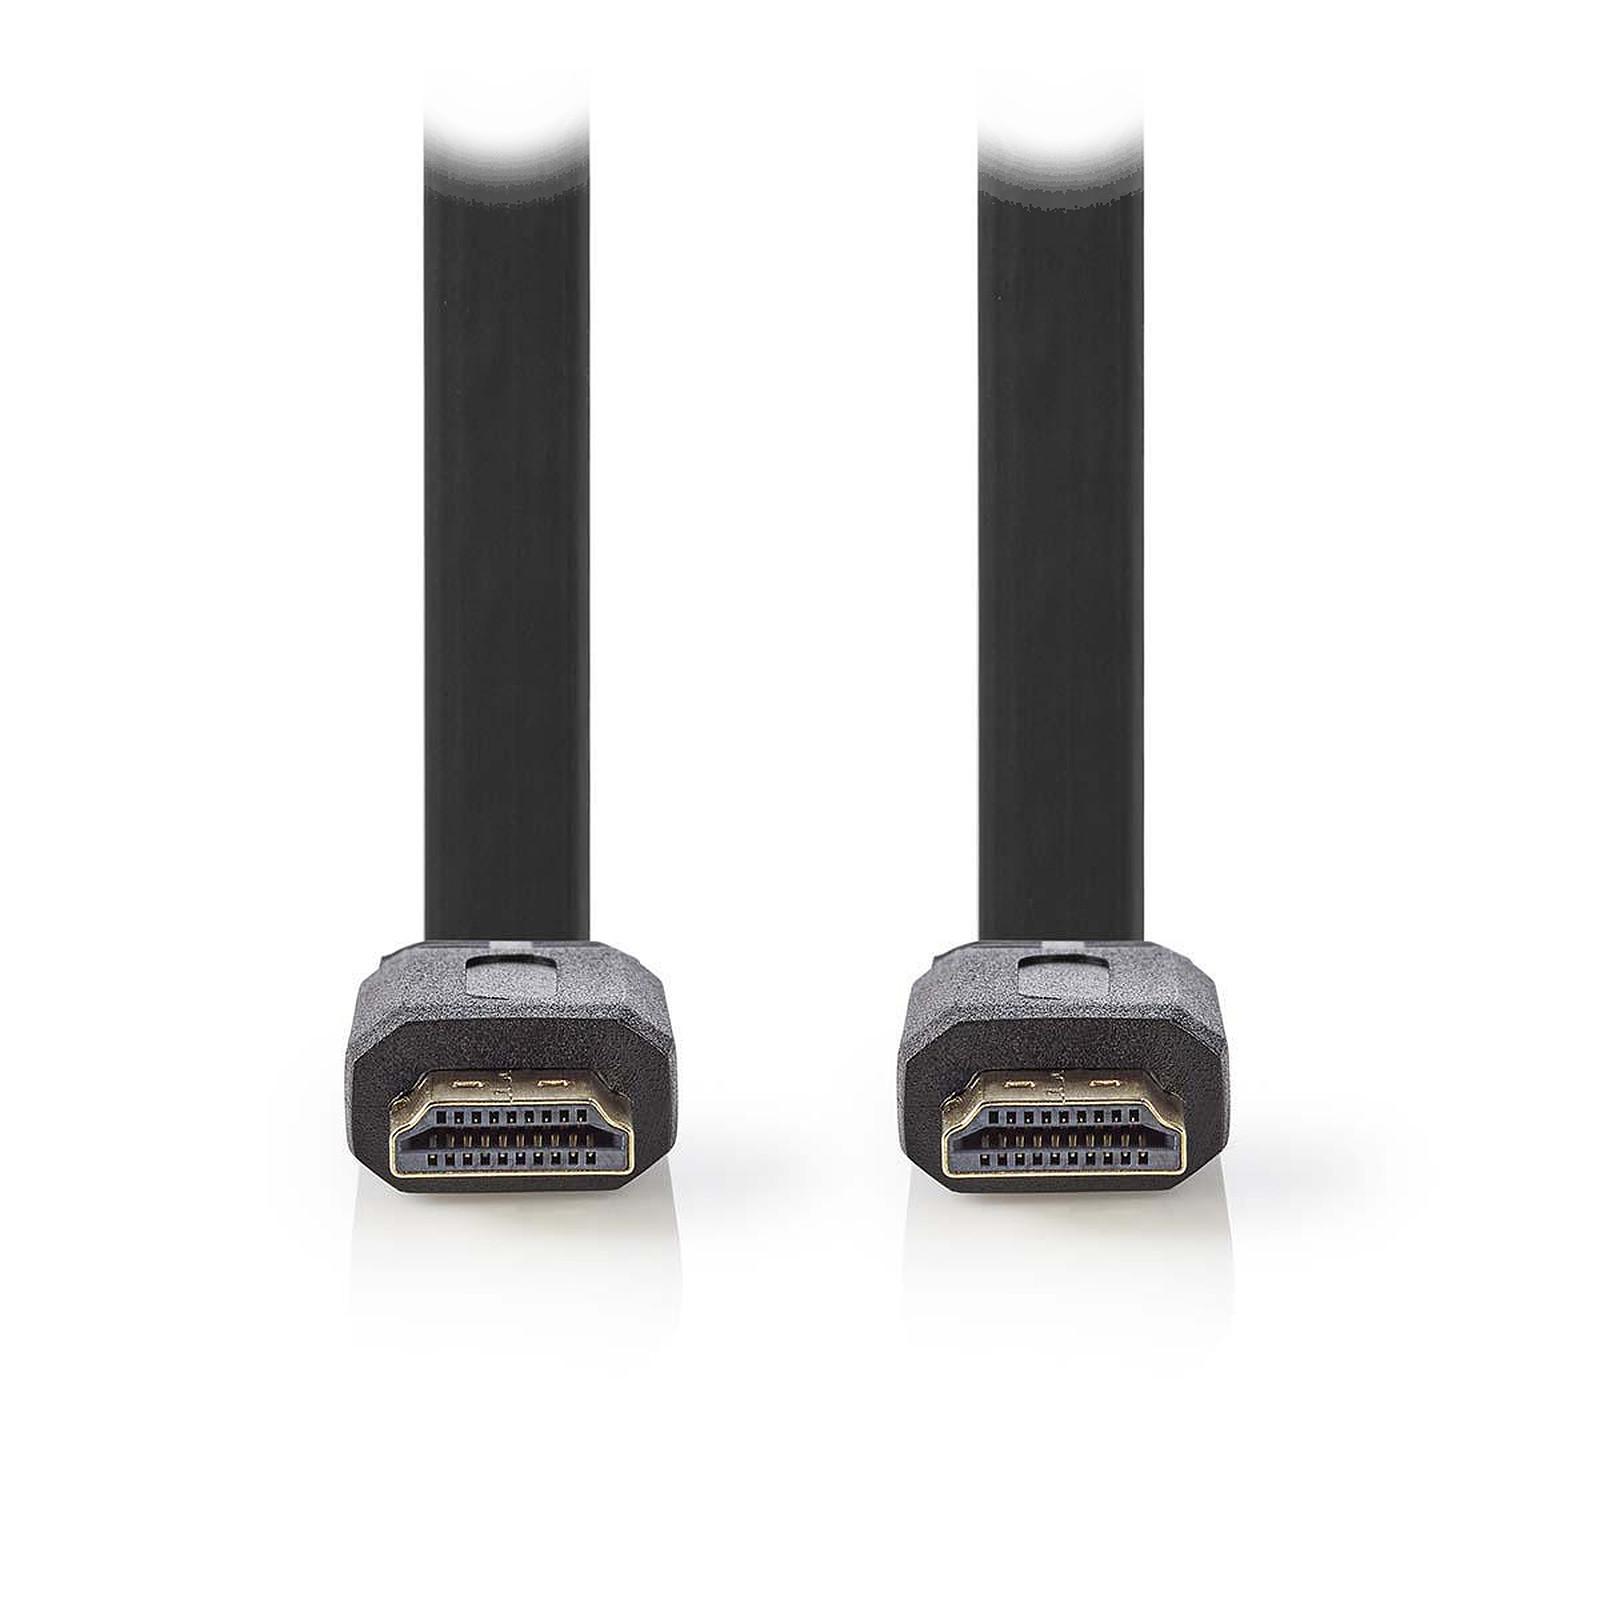 Nedis Câble HDMI plat haute vitesse avec Ethernet Noir (3 mètres)